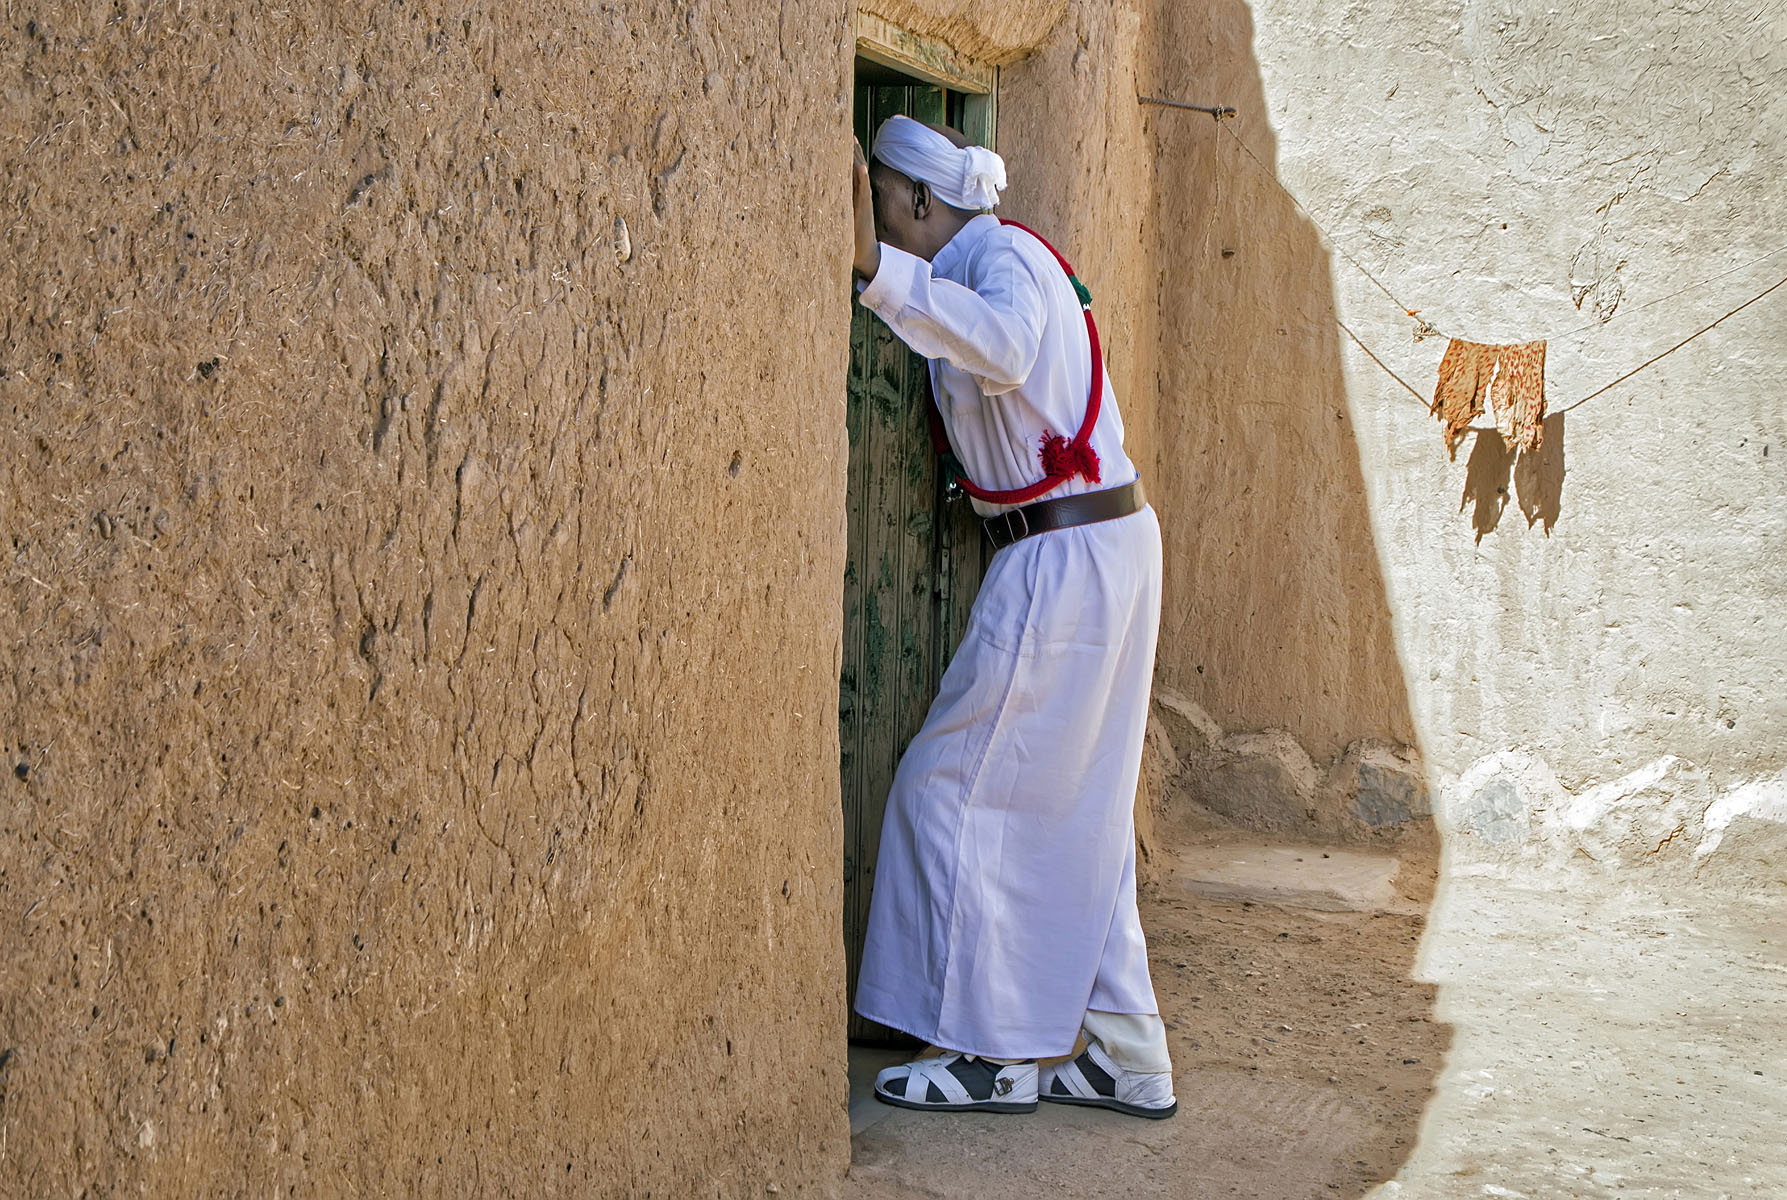 "Khamlia, Morocco, November 2016 No. 2   Archival pigment print  11.25"" x 16.75""  $300  Click image to enlarge   Inquire."